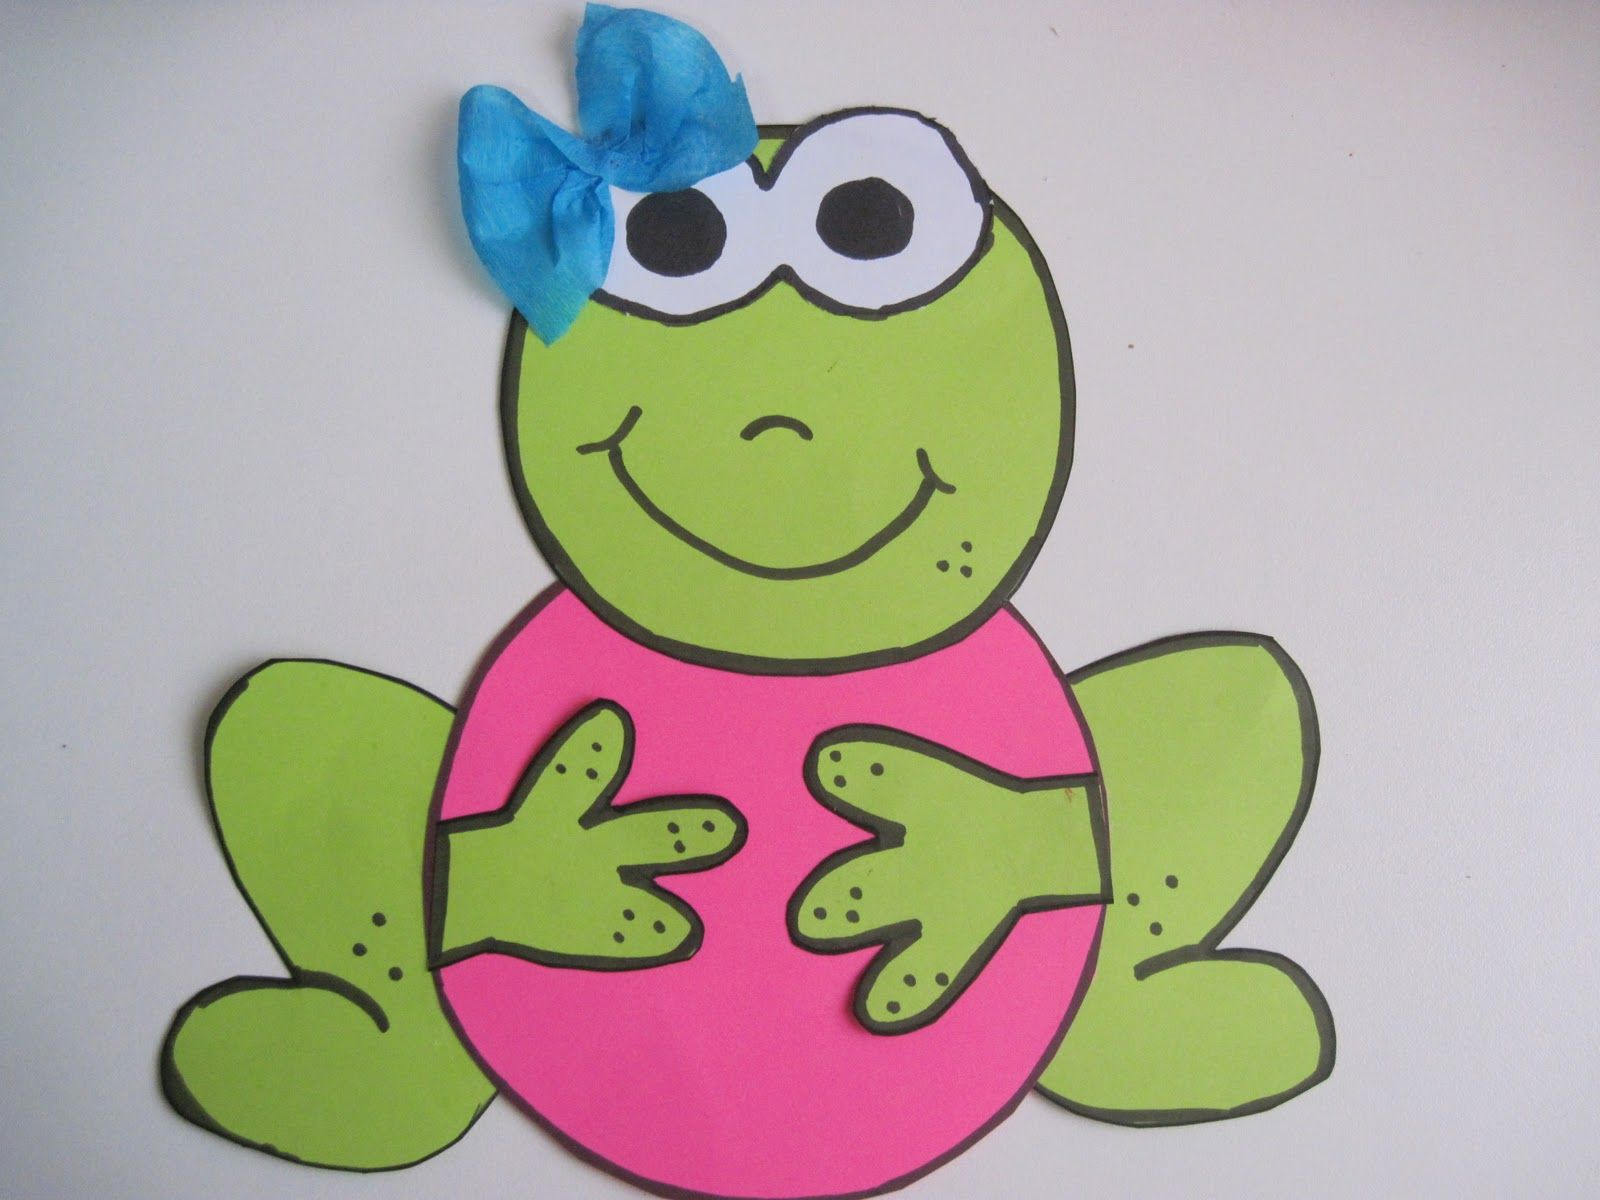 Frog craft idea for kids – Crafts and Worksheets for Preschool ...